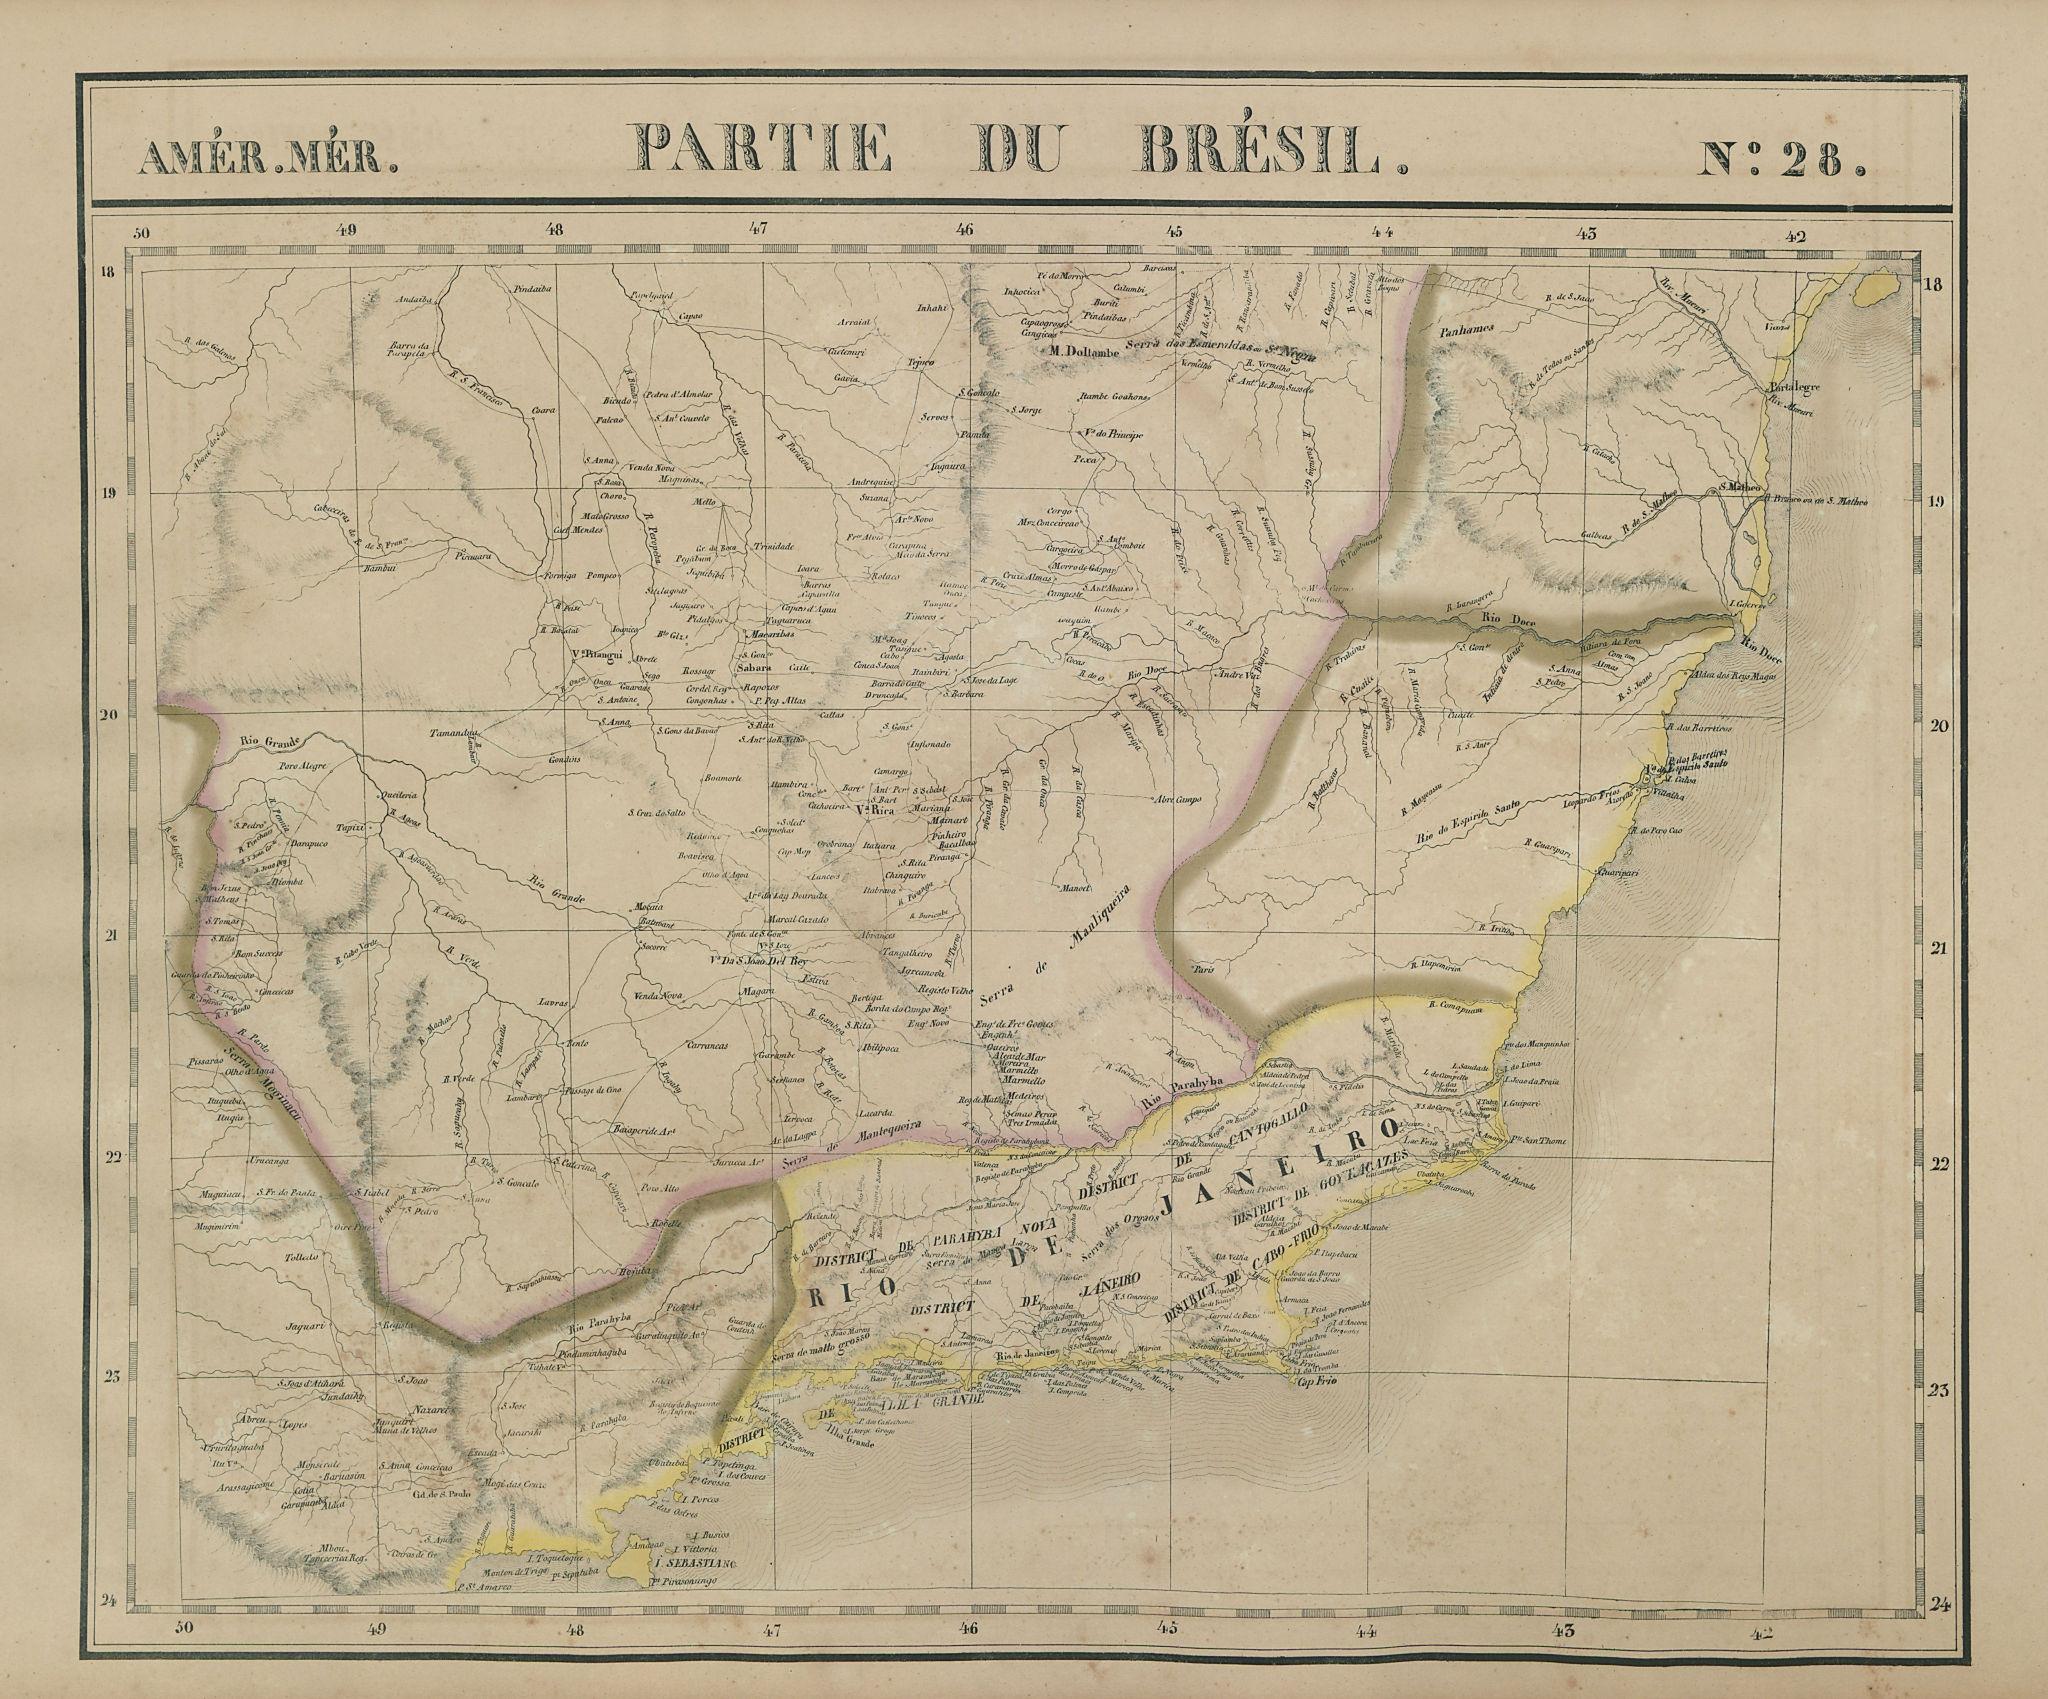 Amér Mér. Brésil 28 SE Brazil. MG Rio de Janeiro SP ES VANDERMAELEN 1827 map